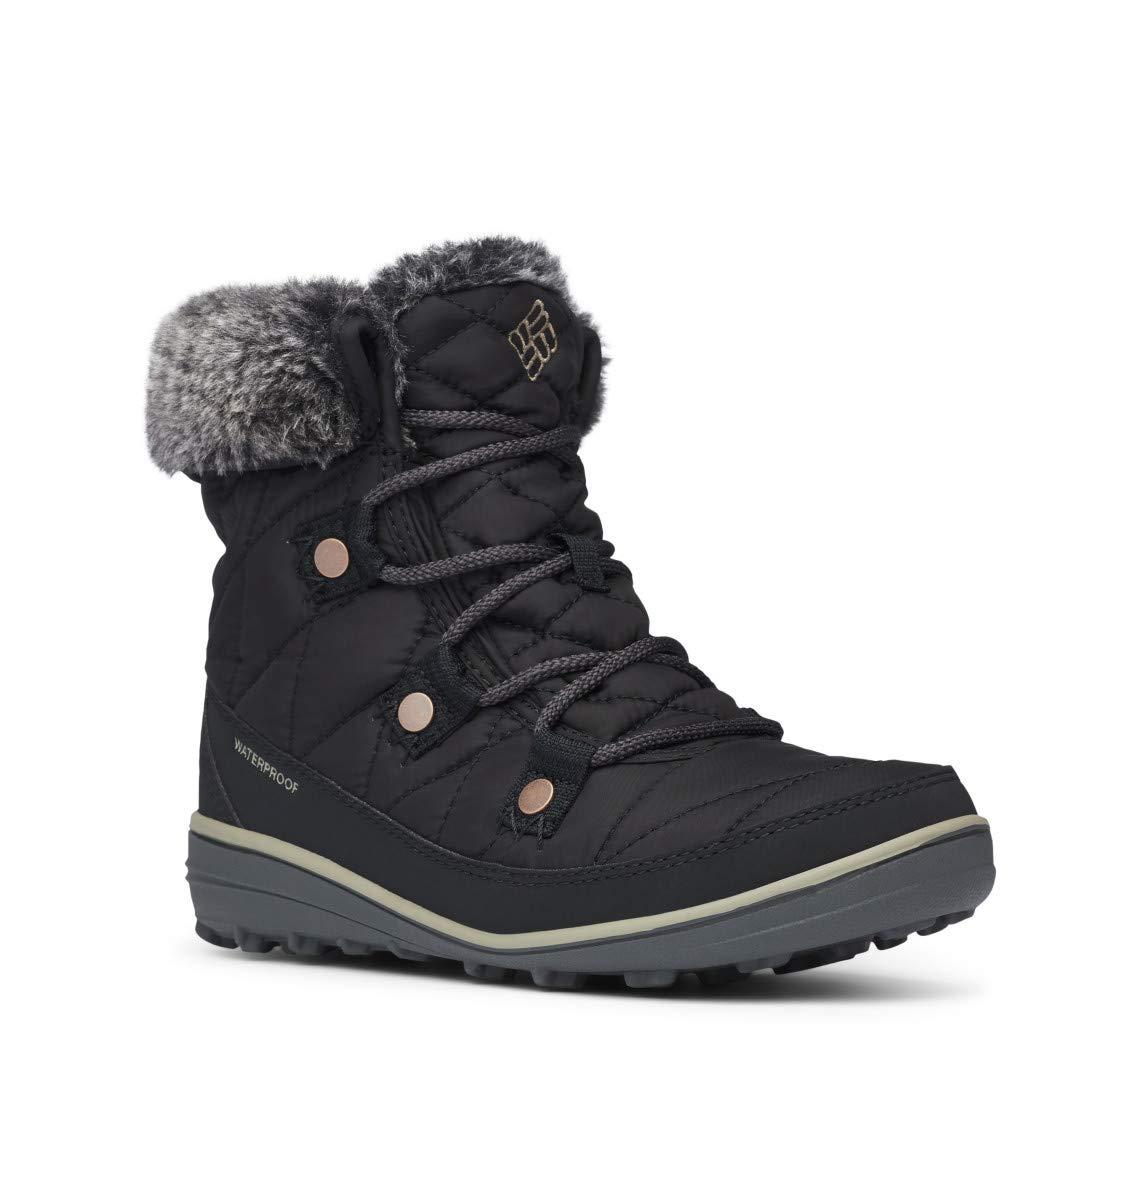 Columbia Women's Heavenly Shorty Omni-Heat Snow Boot, Black, Kettle, 12 Regular US by Columbia